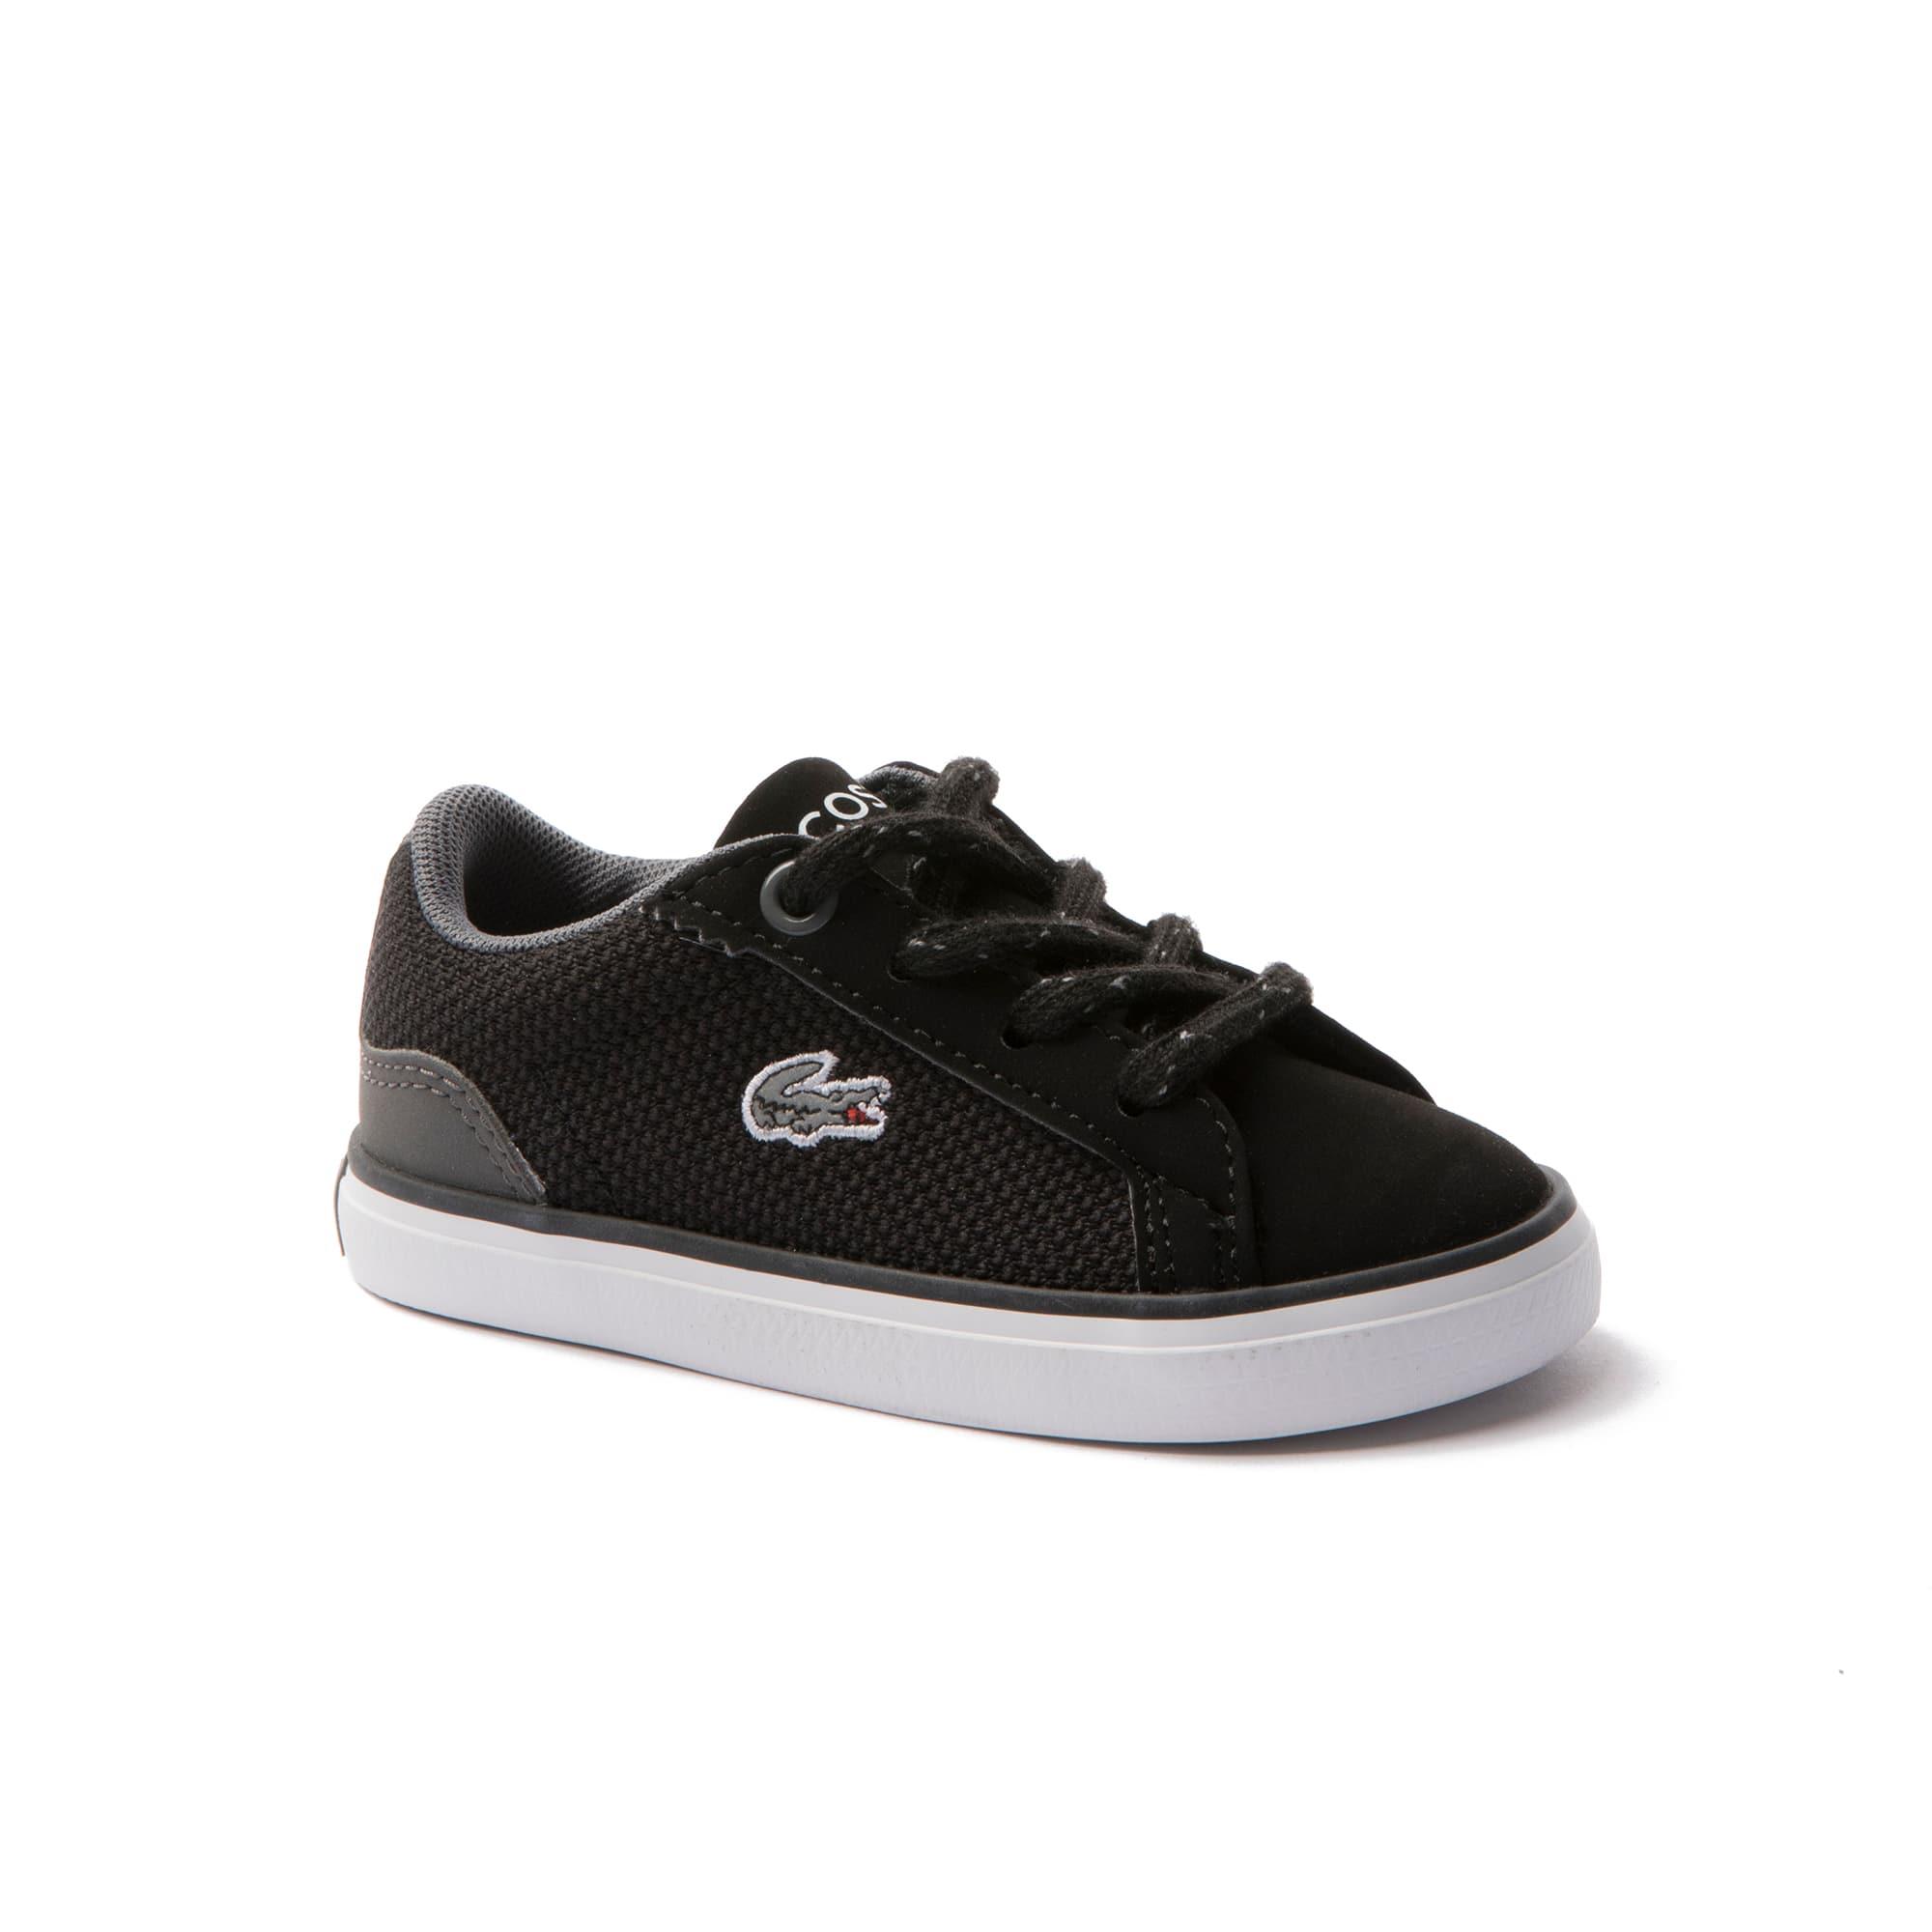 Kids' Lerond Textile Sneakers